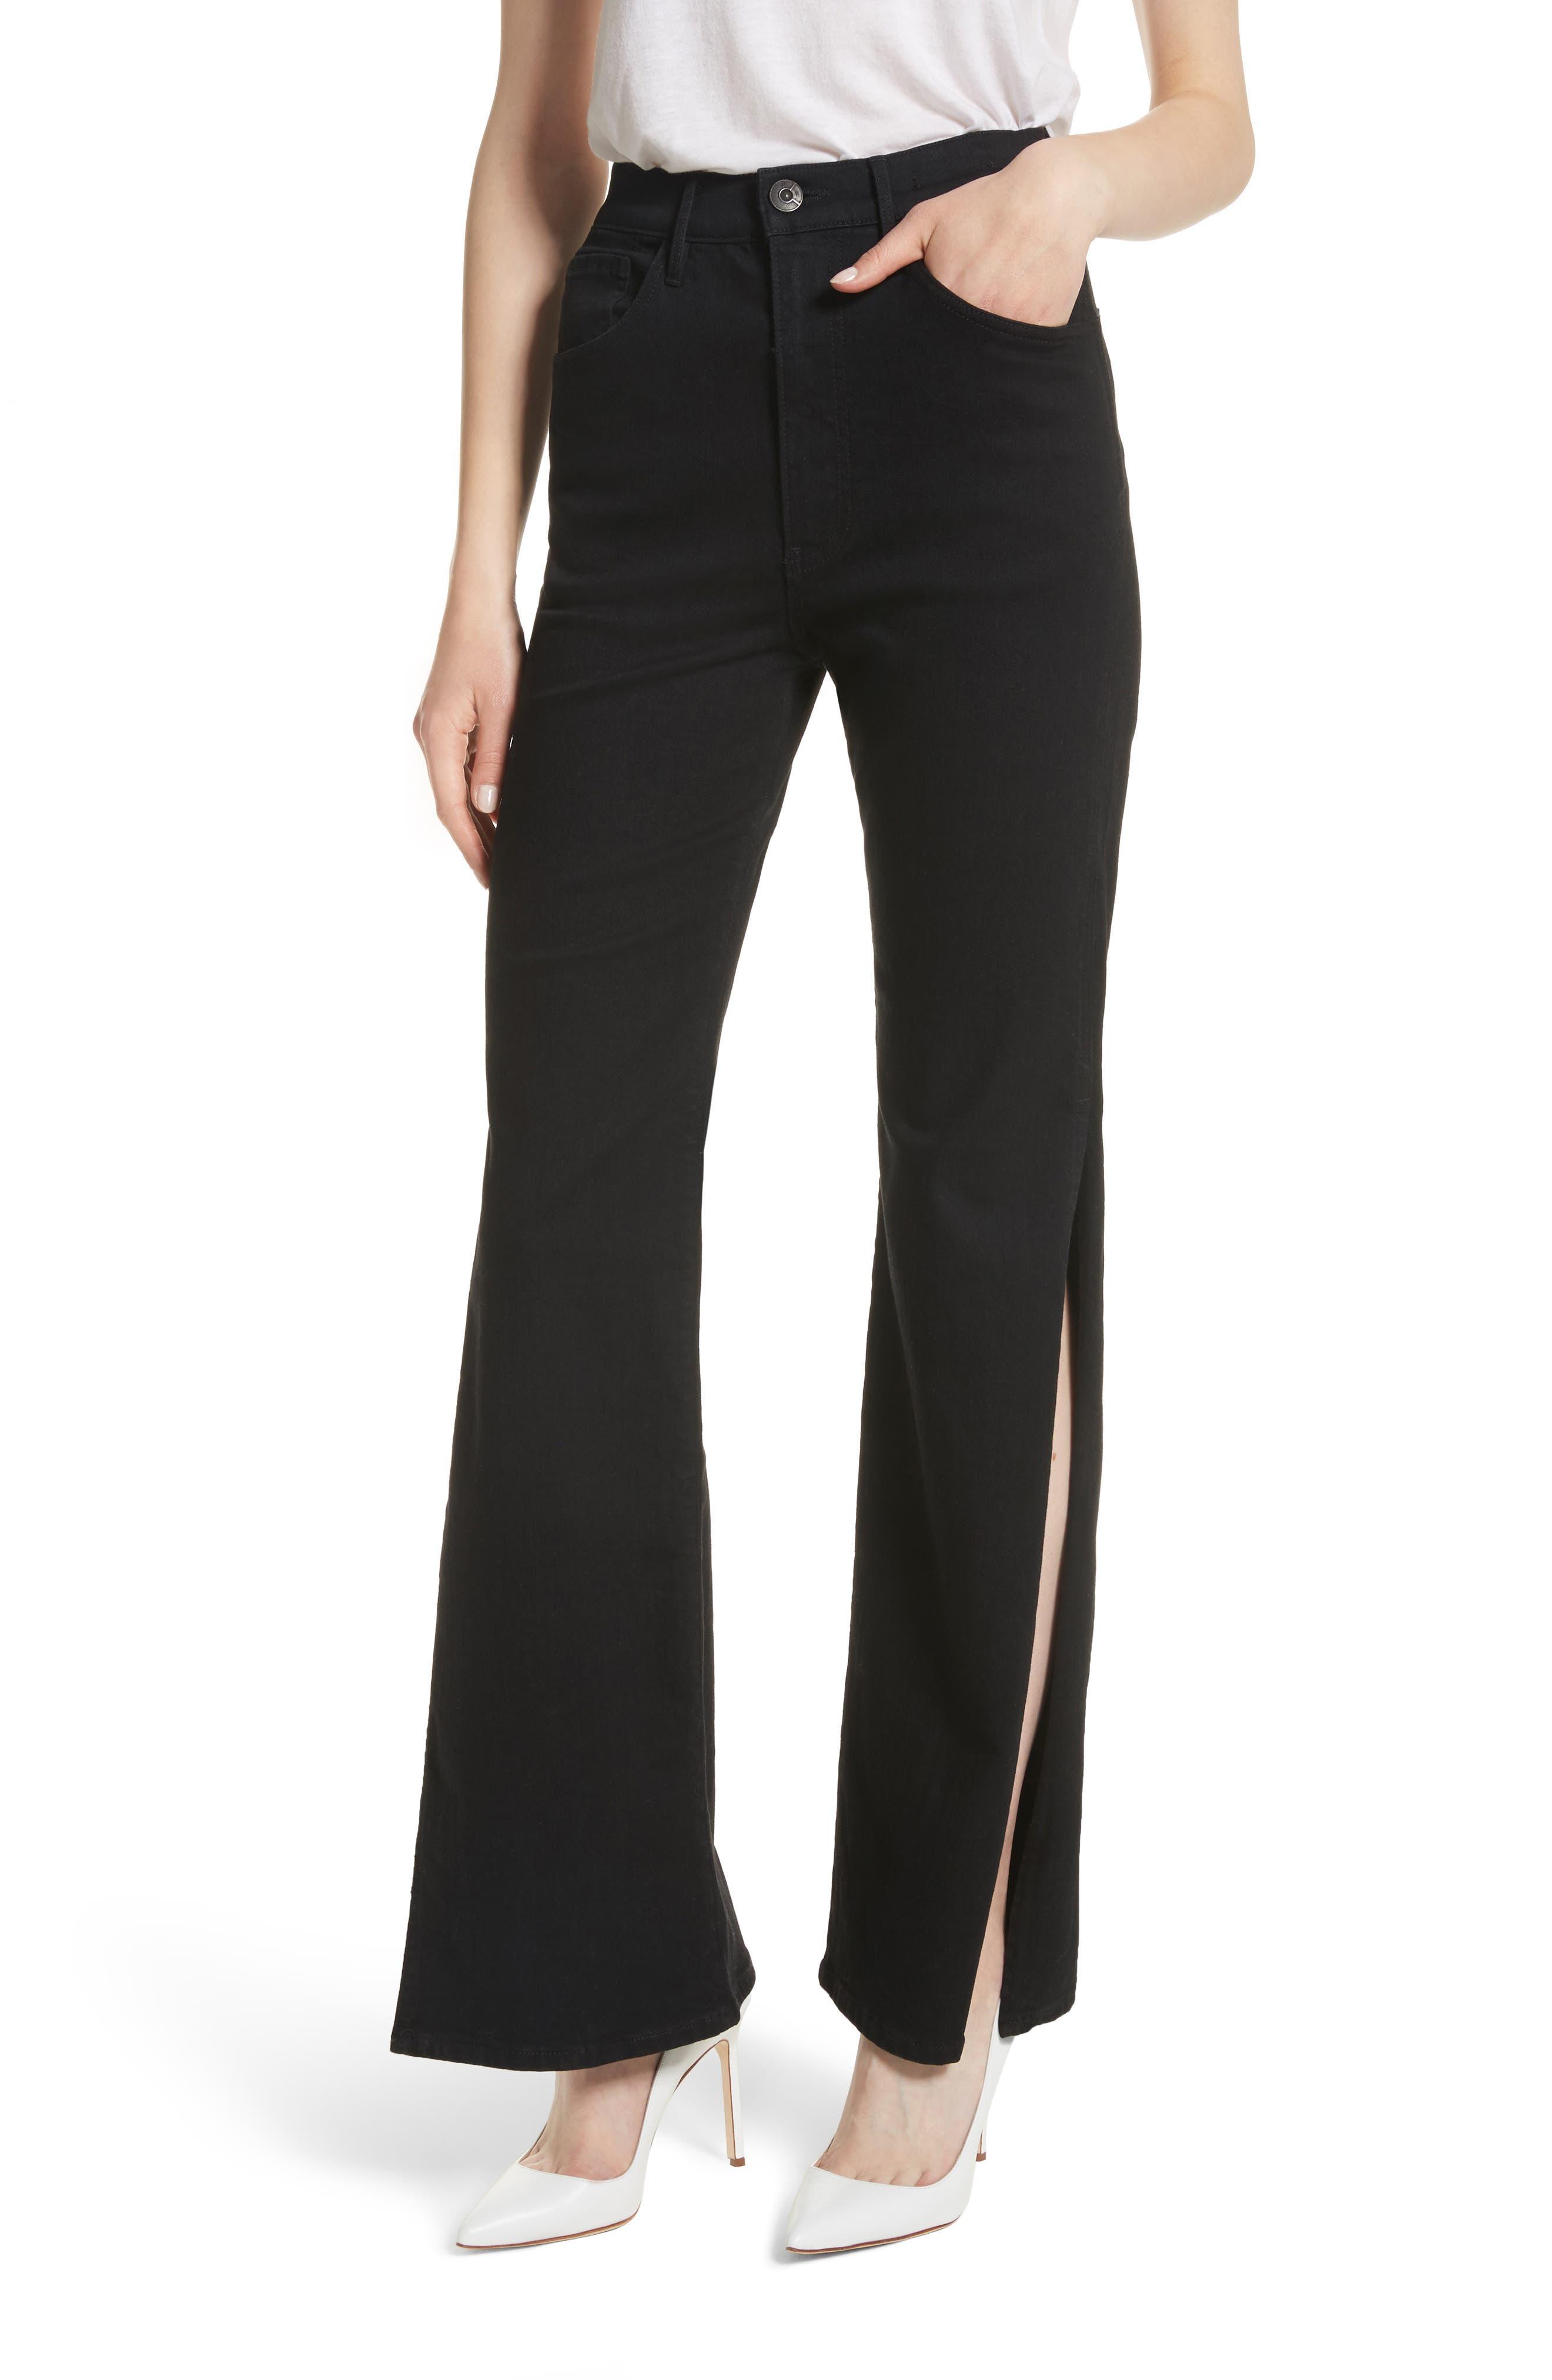 W4 Adeline High Waist Split Flare Jeans,                             Main thumbnail 1, color,                             001